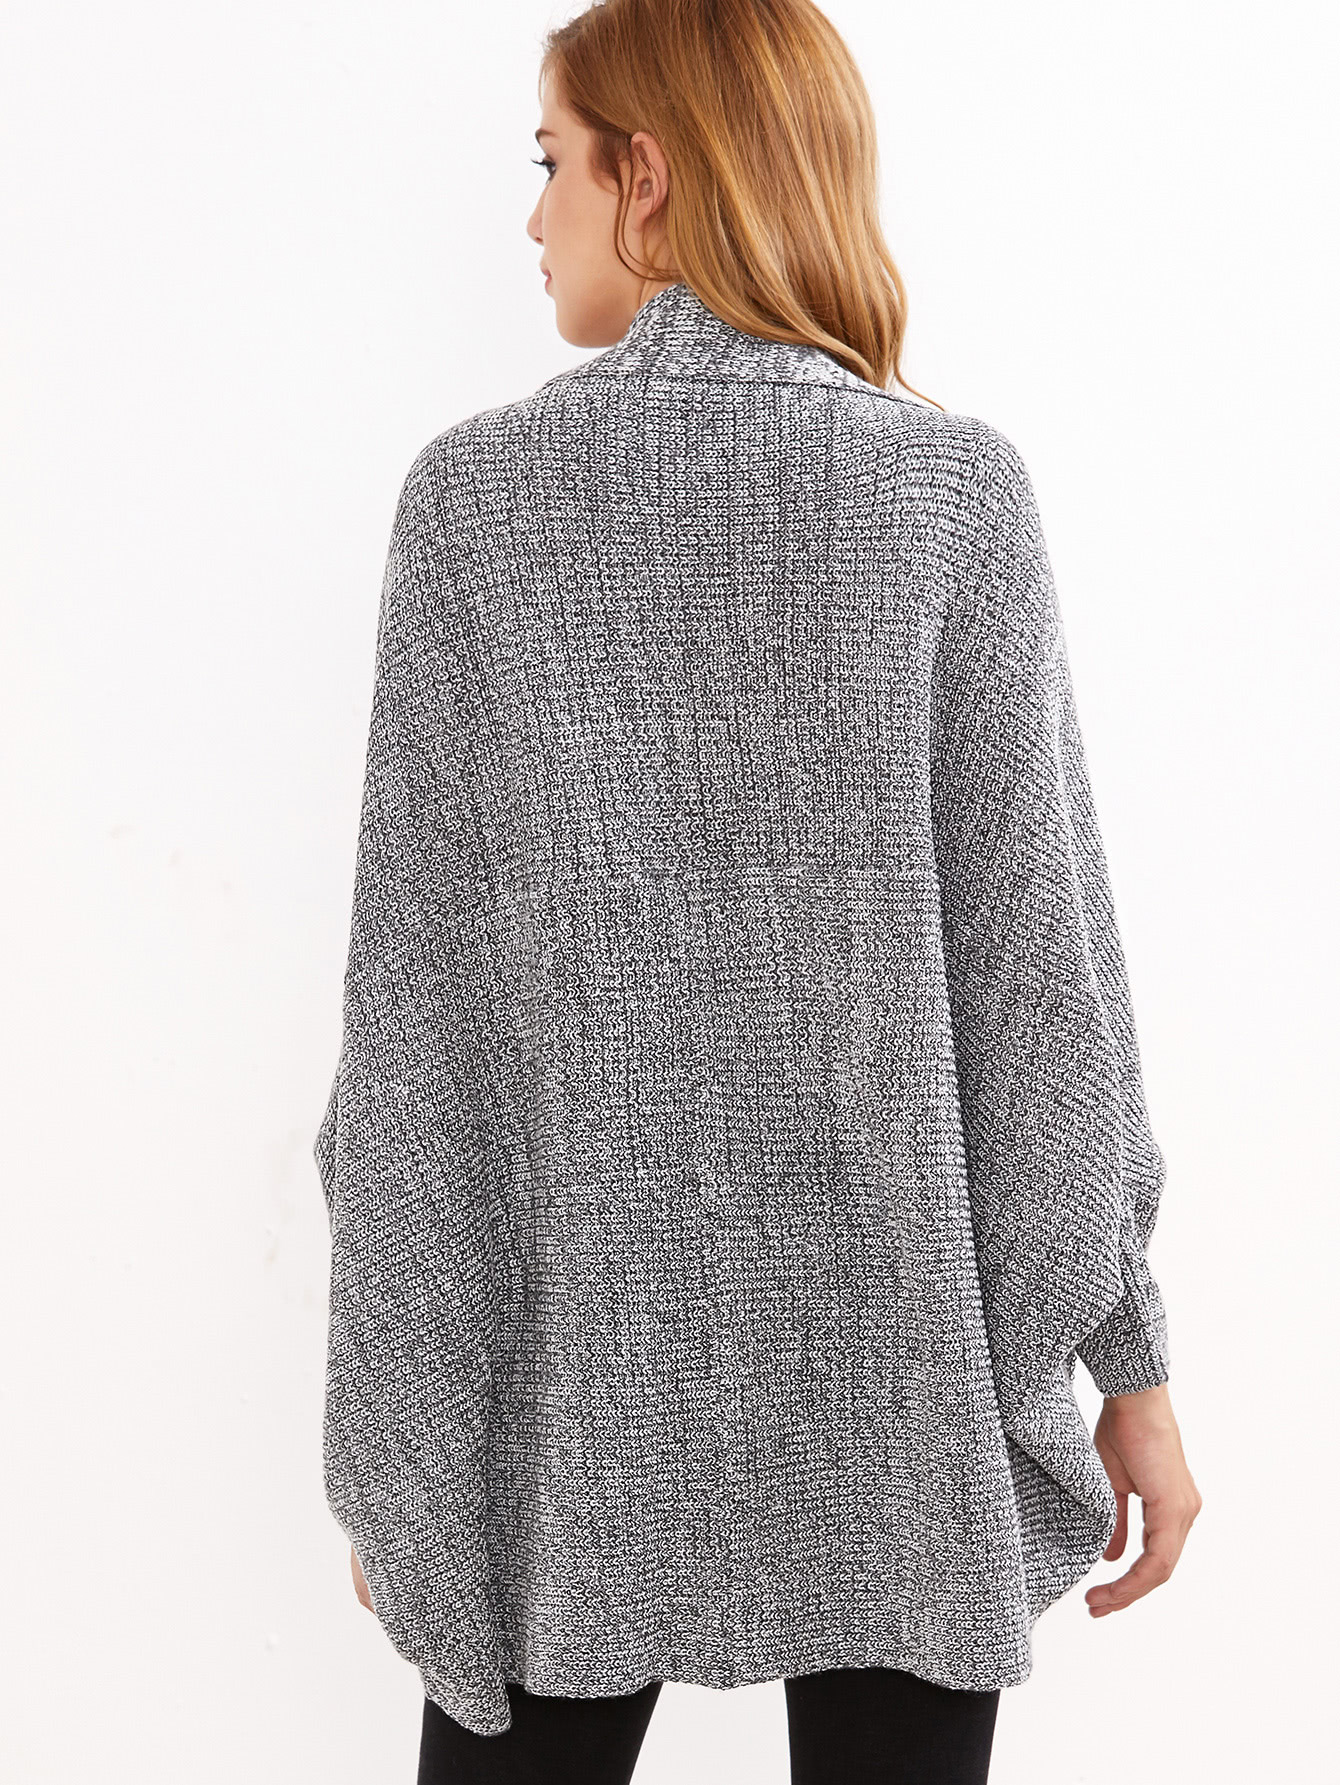 sweater161031453_2